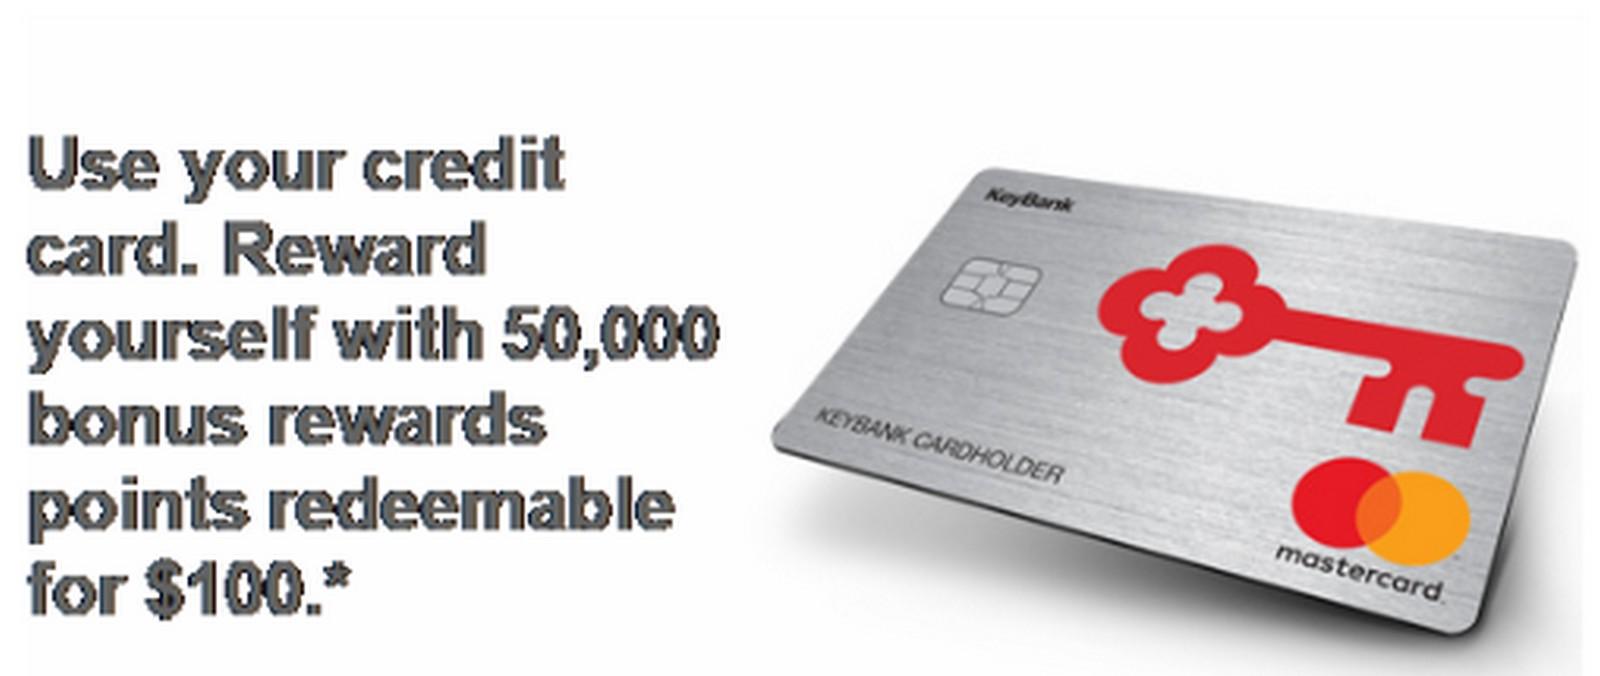 KeyBank Rewards credit card